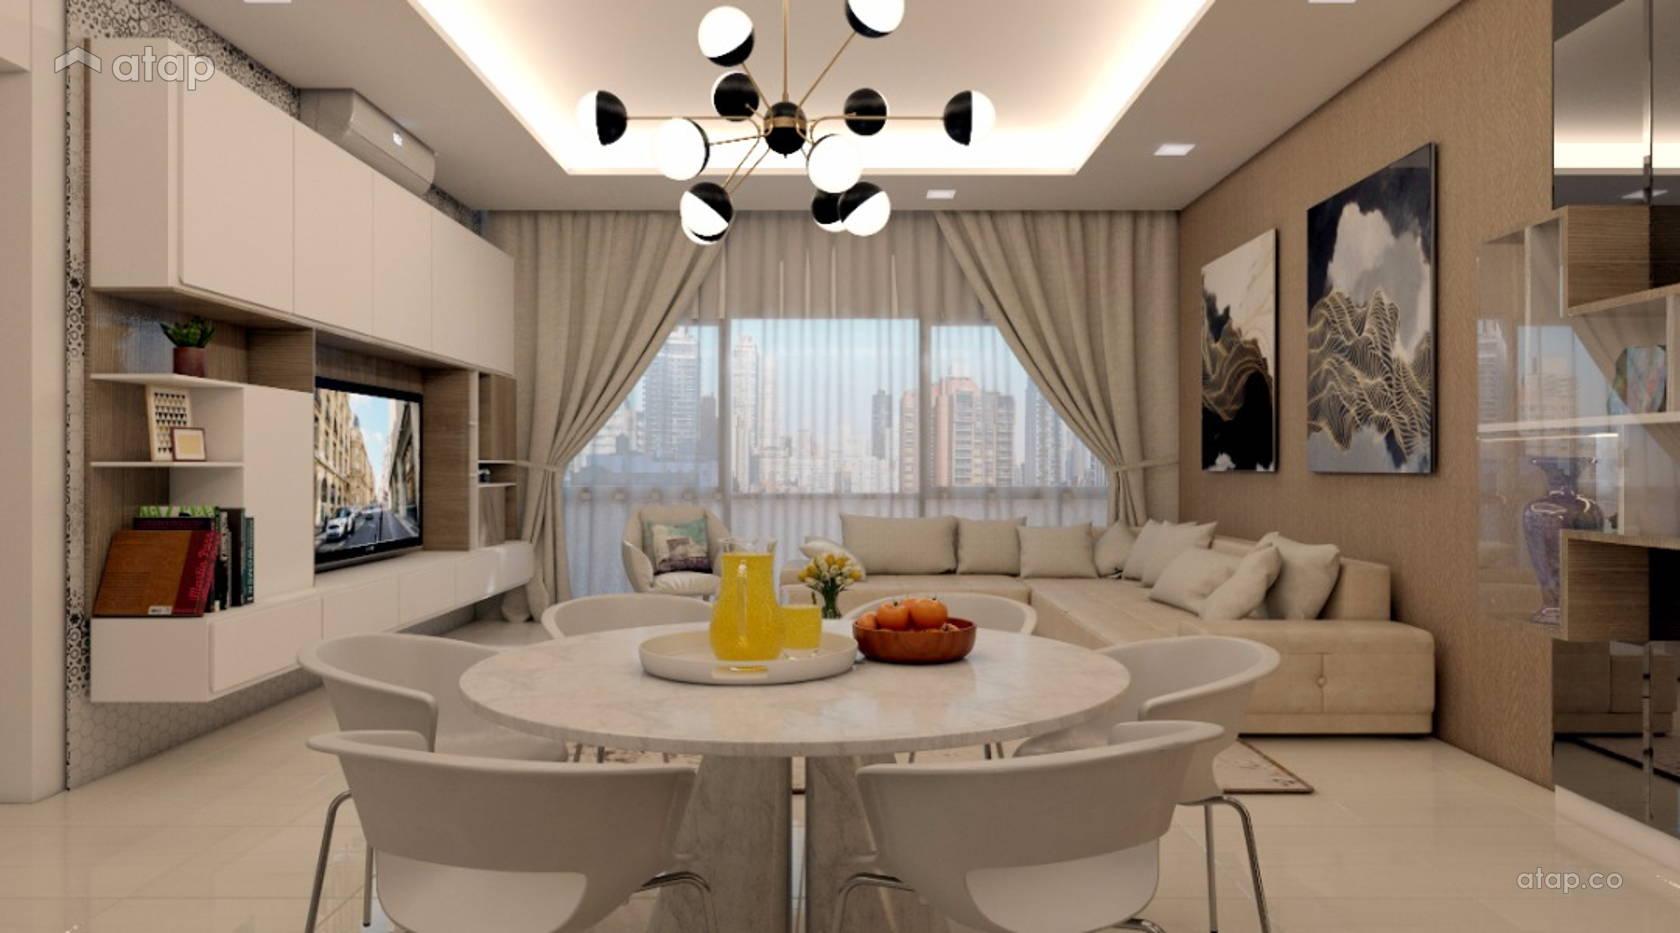 Modern Dining Room Living Room Condominium Design Ideas Photos Malaysia Atap Co